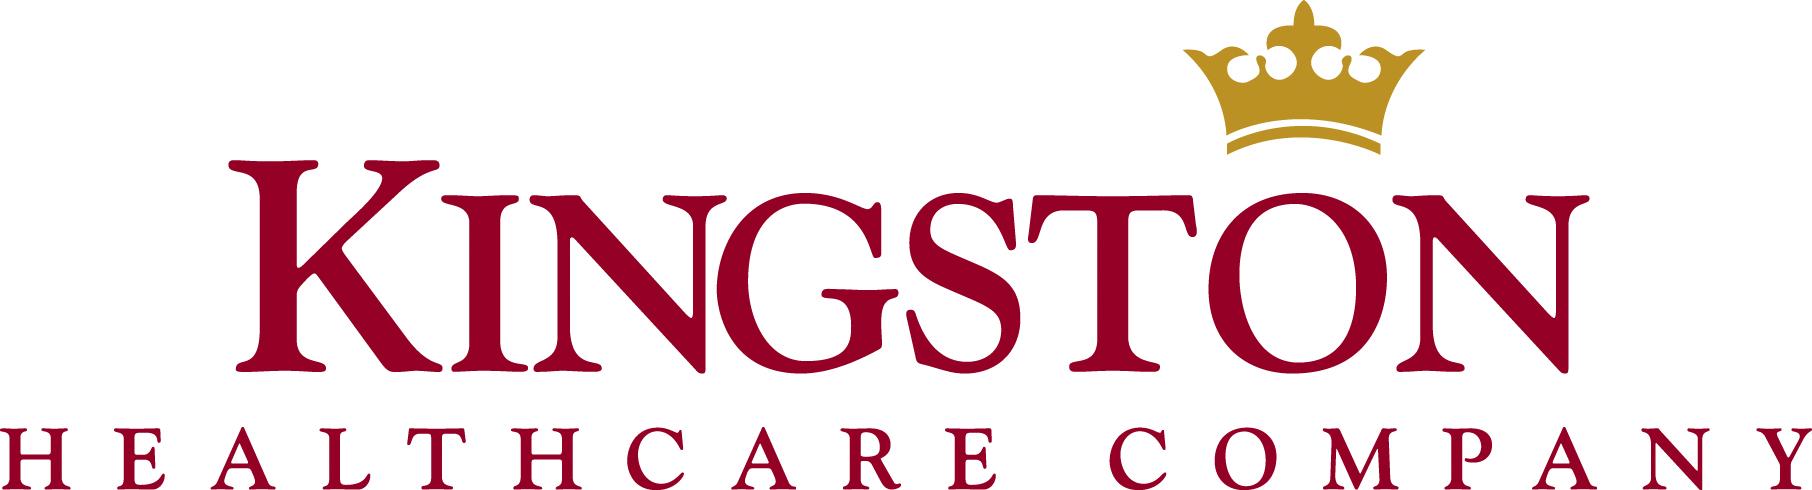 Kingston HealthCare Company logo